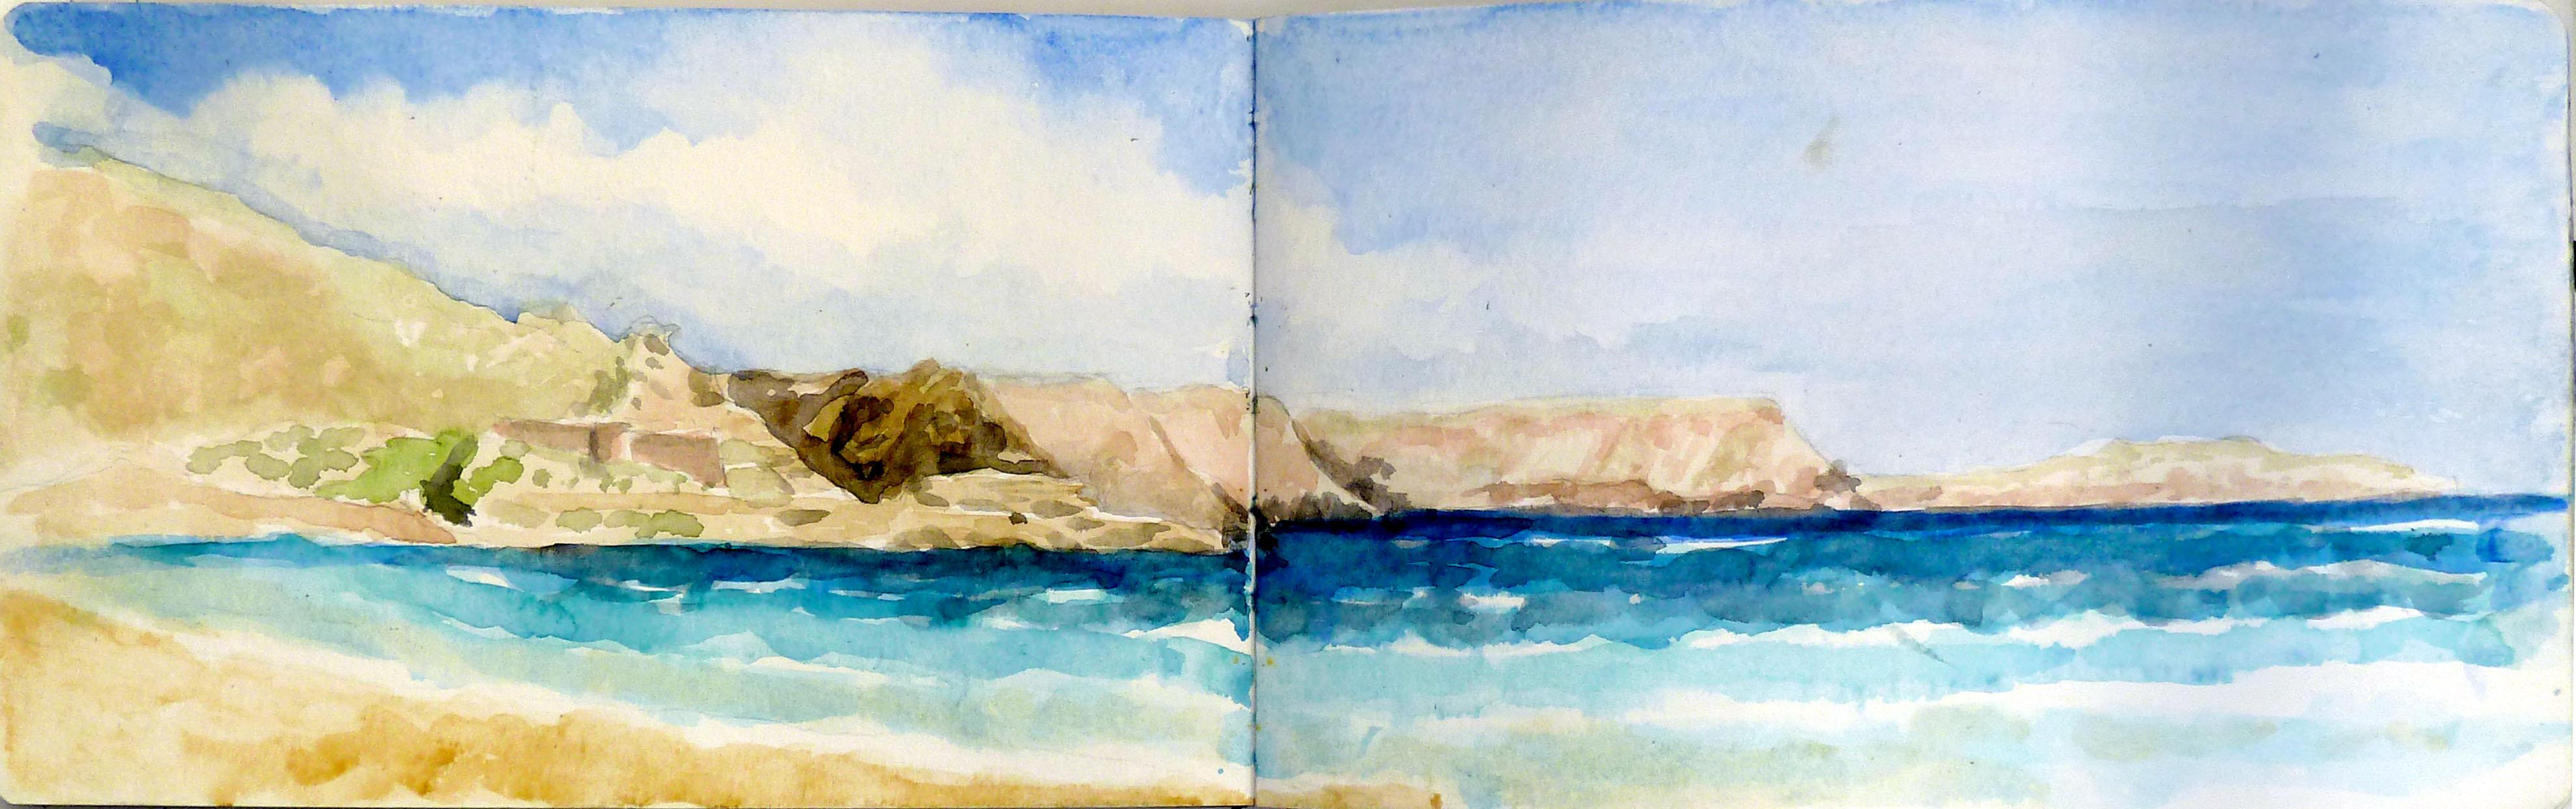 playa del playazo